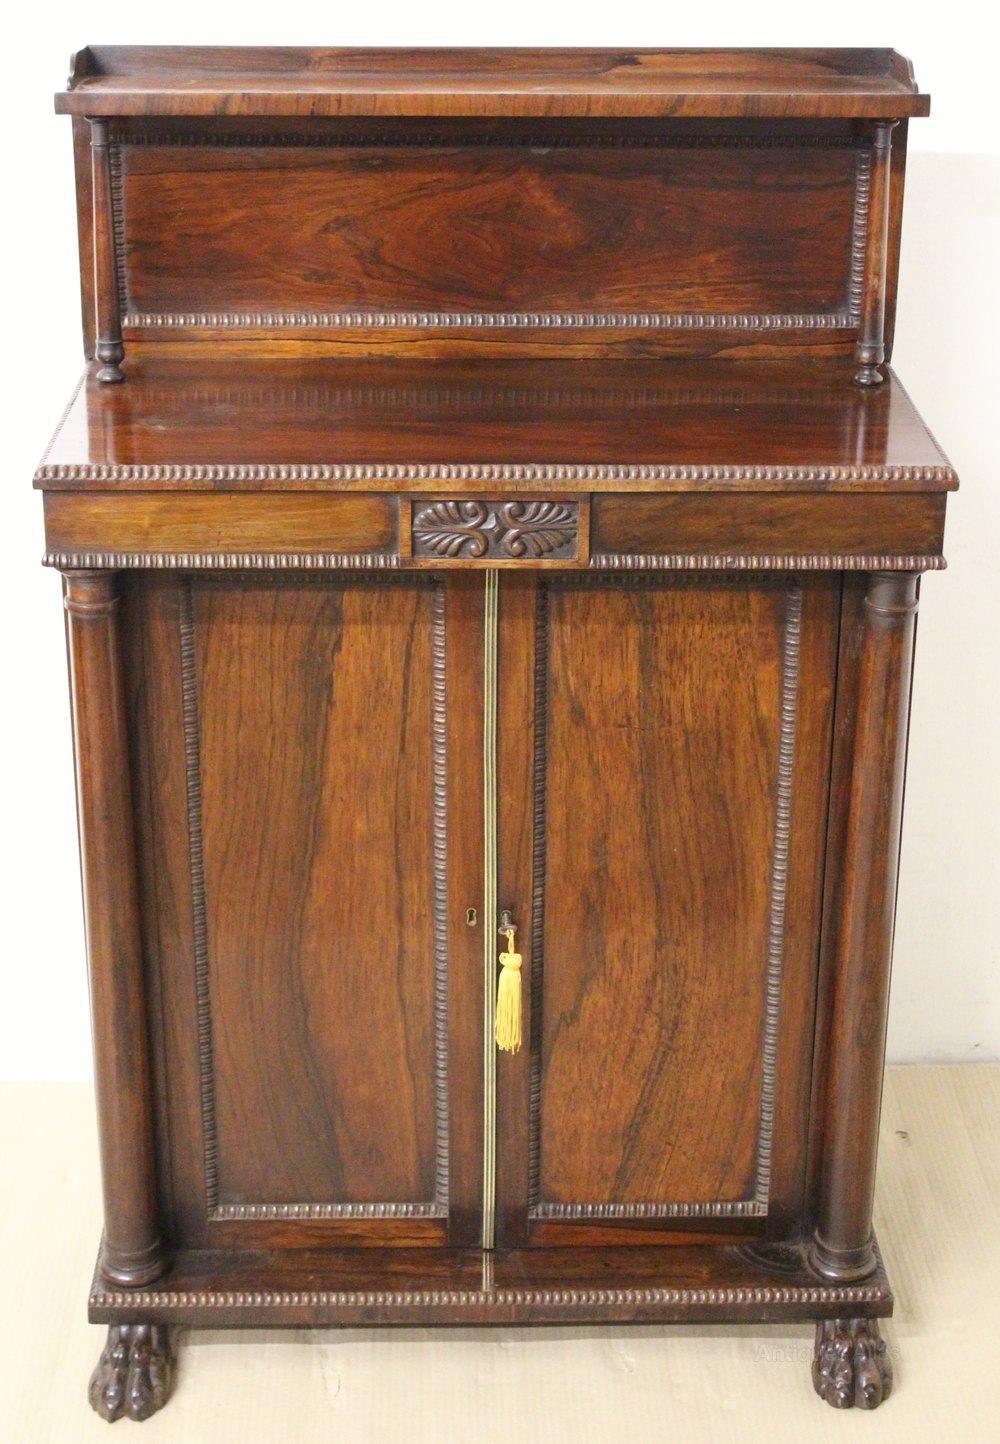 Regency Rosewood Chiffonier Antiques Atlas